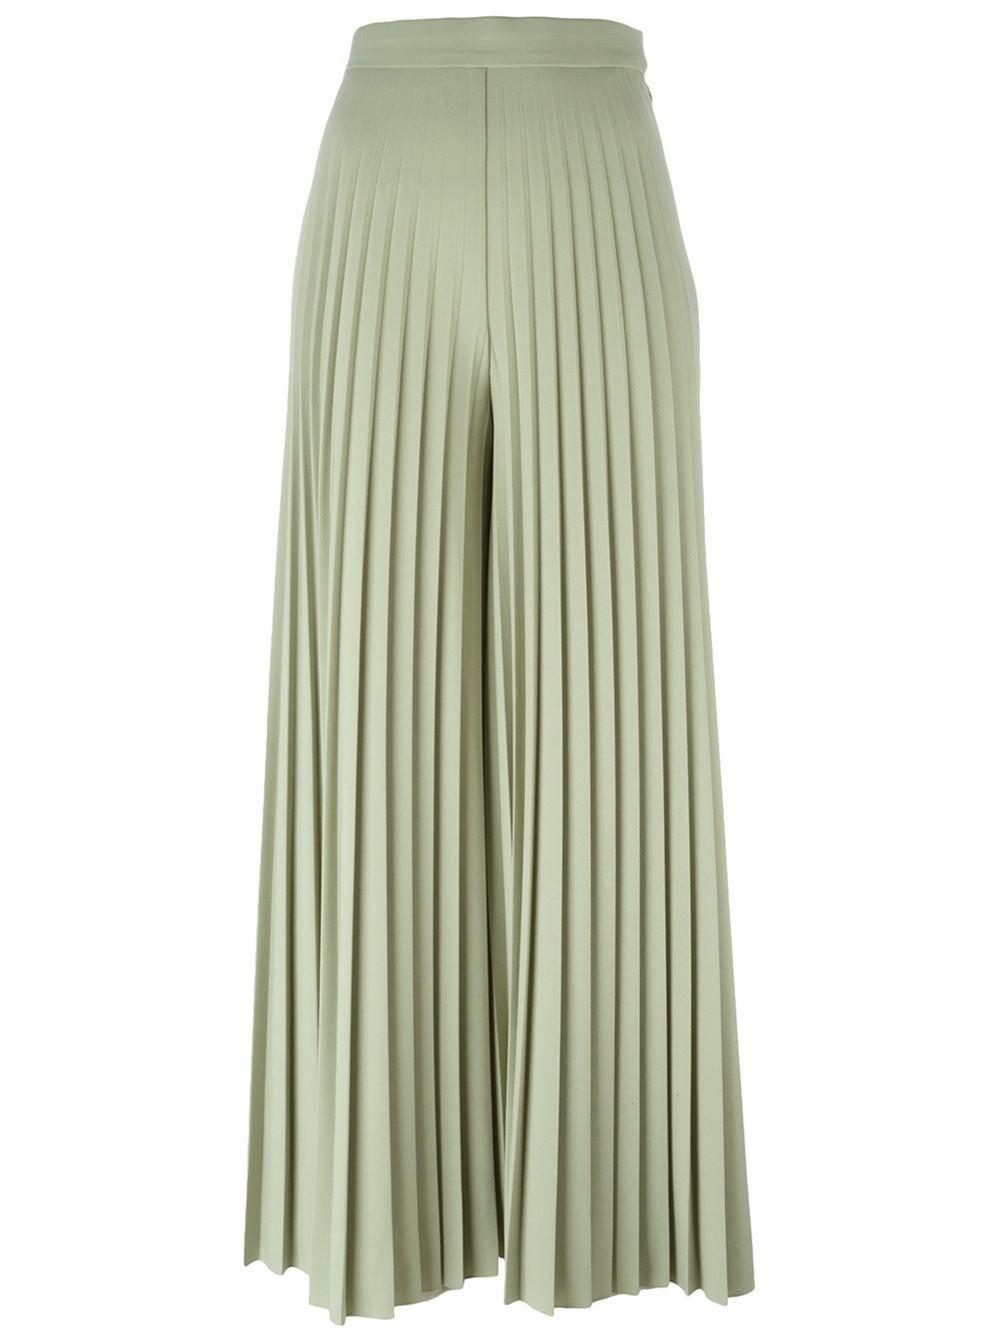 00c6b7fc64 Givenchy pleated palazzo pants | pants in 2019 | Palazzo pants ...